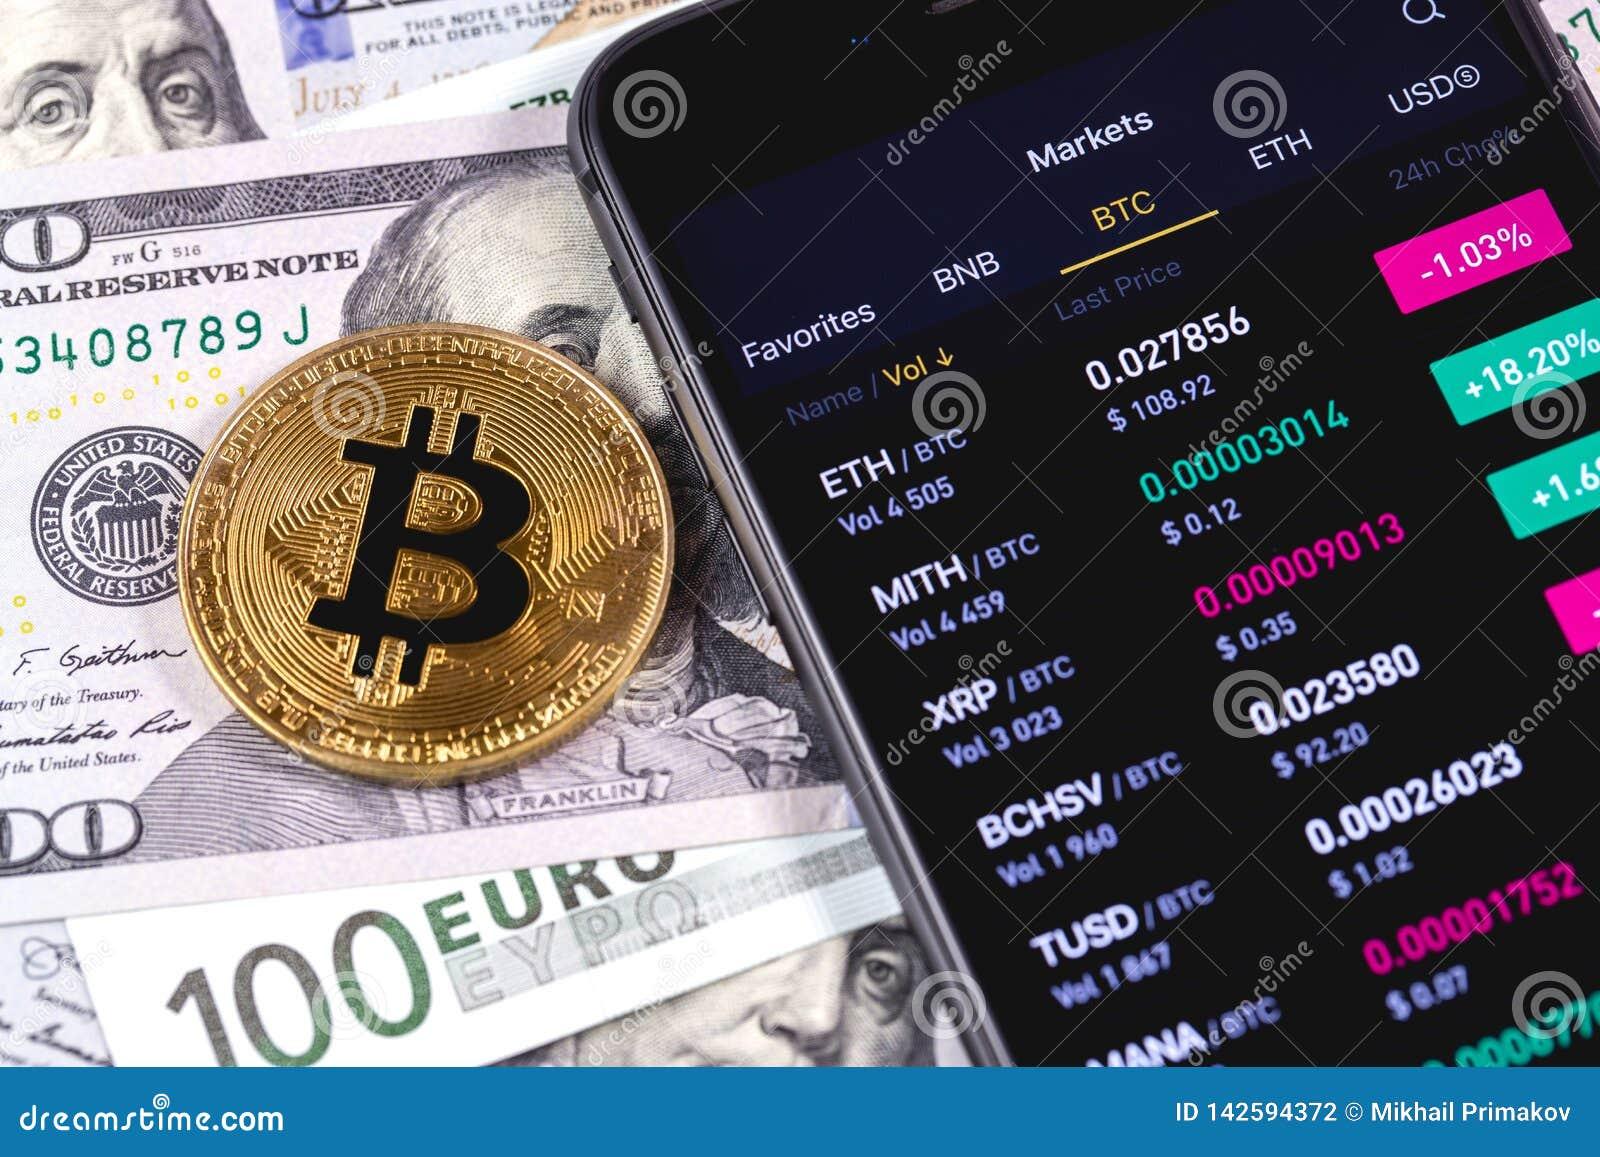 Quanto costa 20 Euro (Euro) in Bitcoin (Bitcoin)?